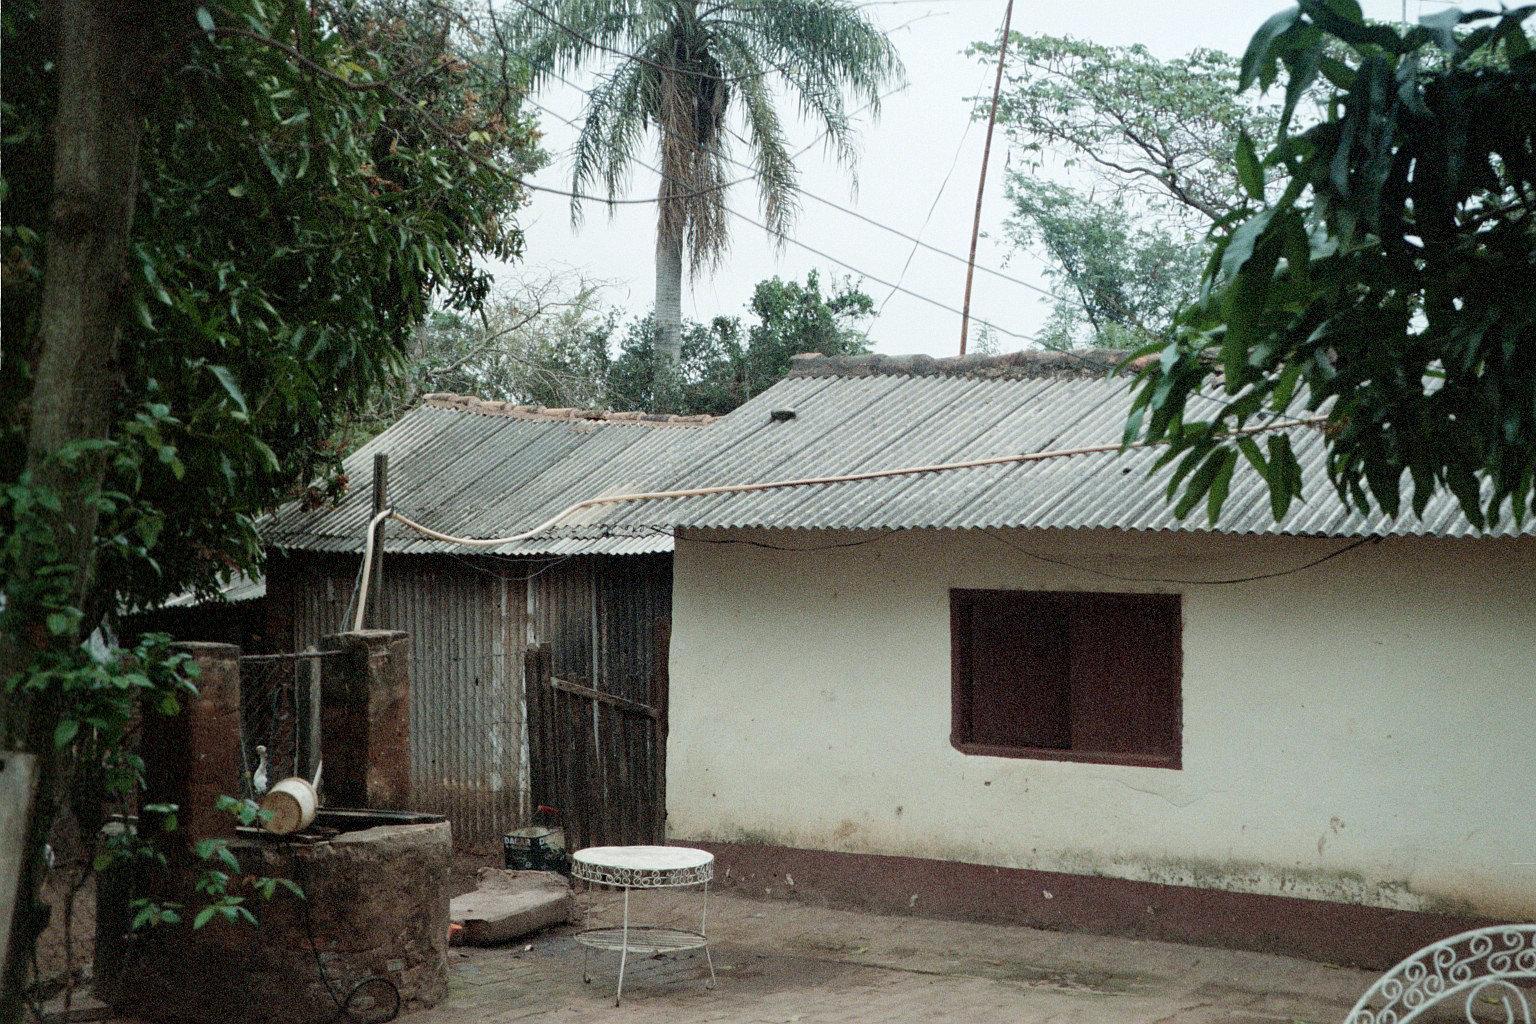 House in Costa Peña. Photo courtesy of Vanessa Johnson